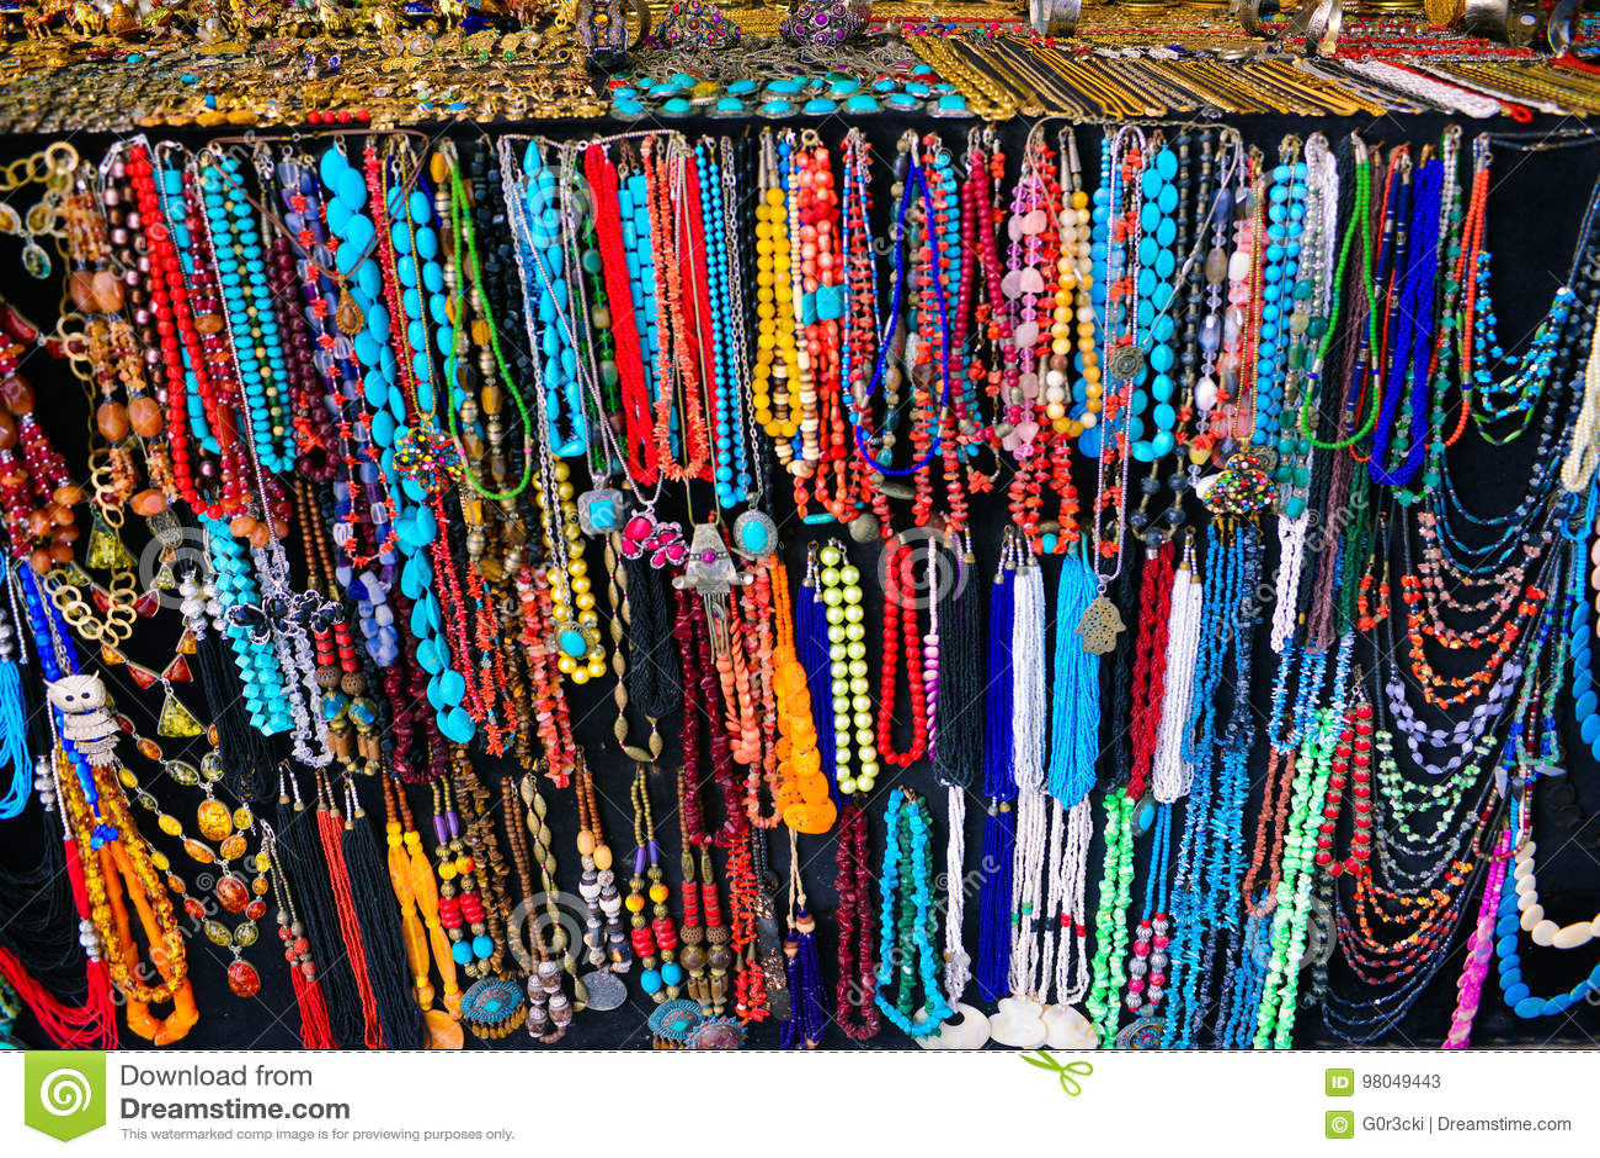 a76ba26bfbdc Colorful tunisian or arabic necklaces